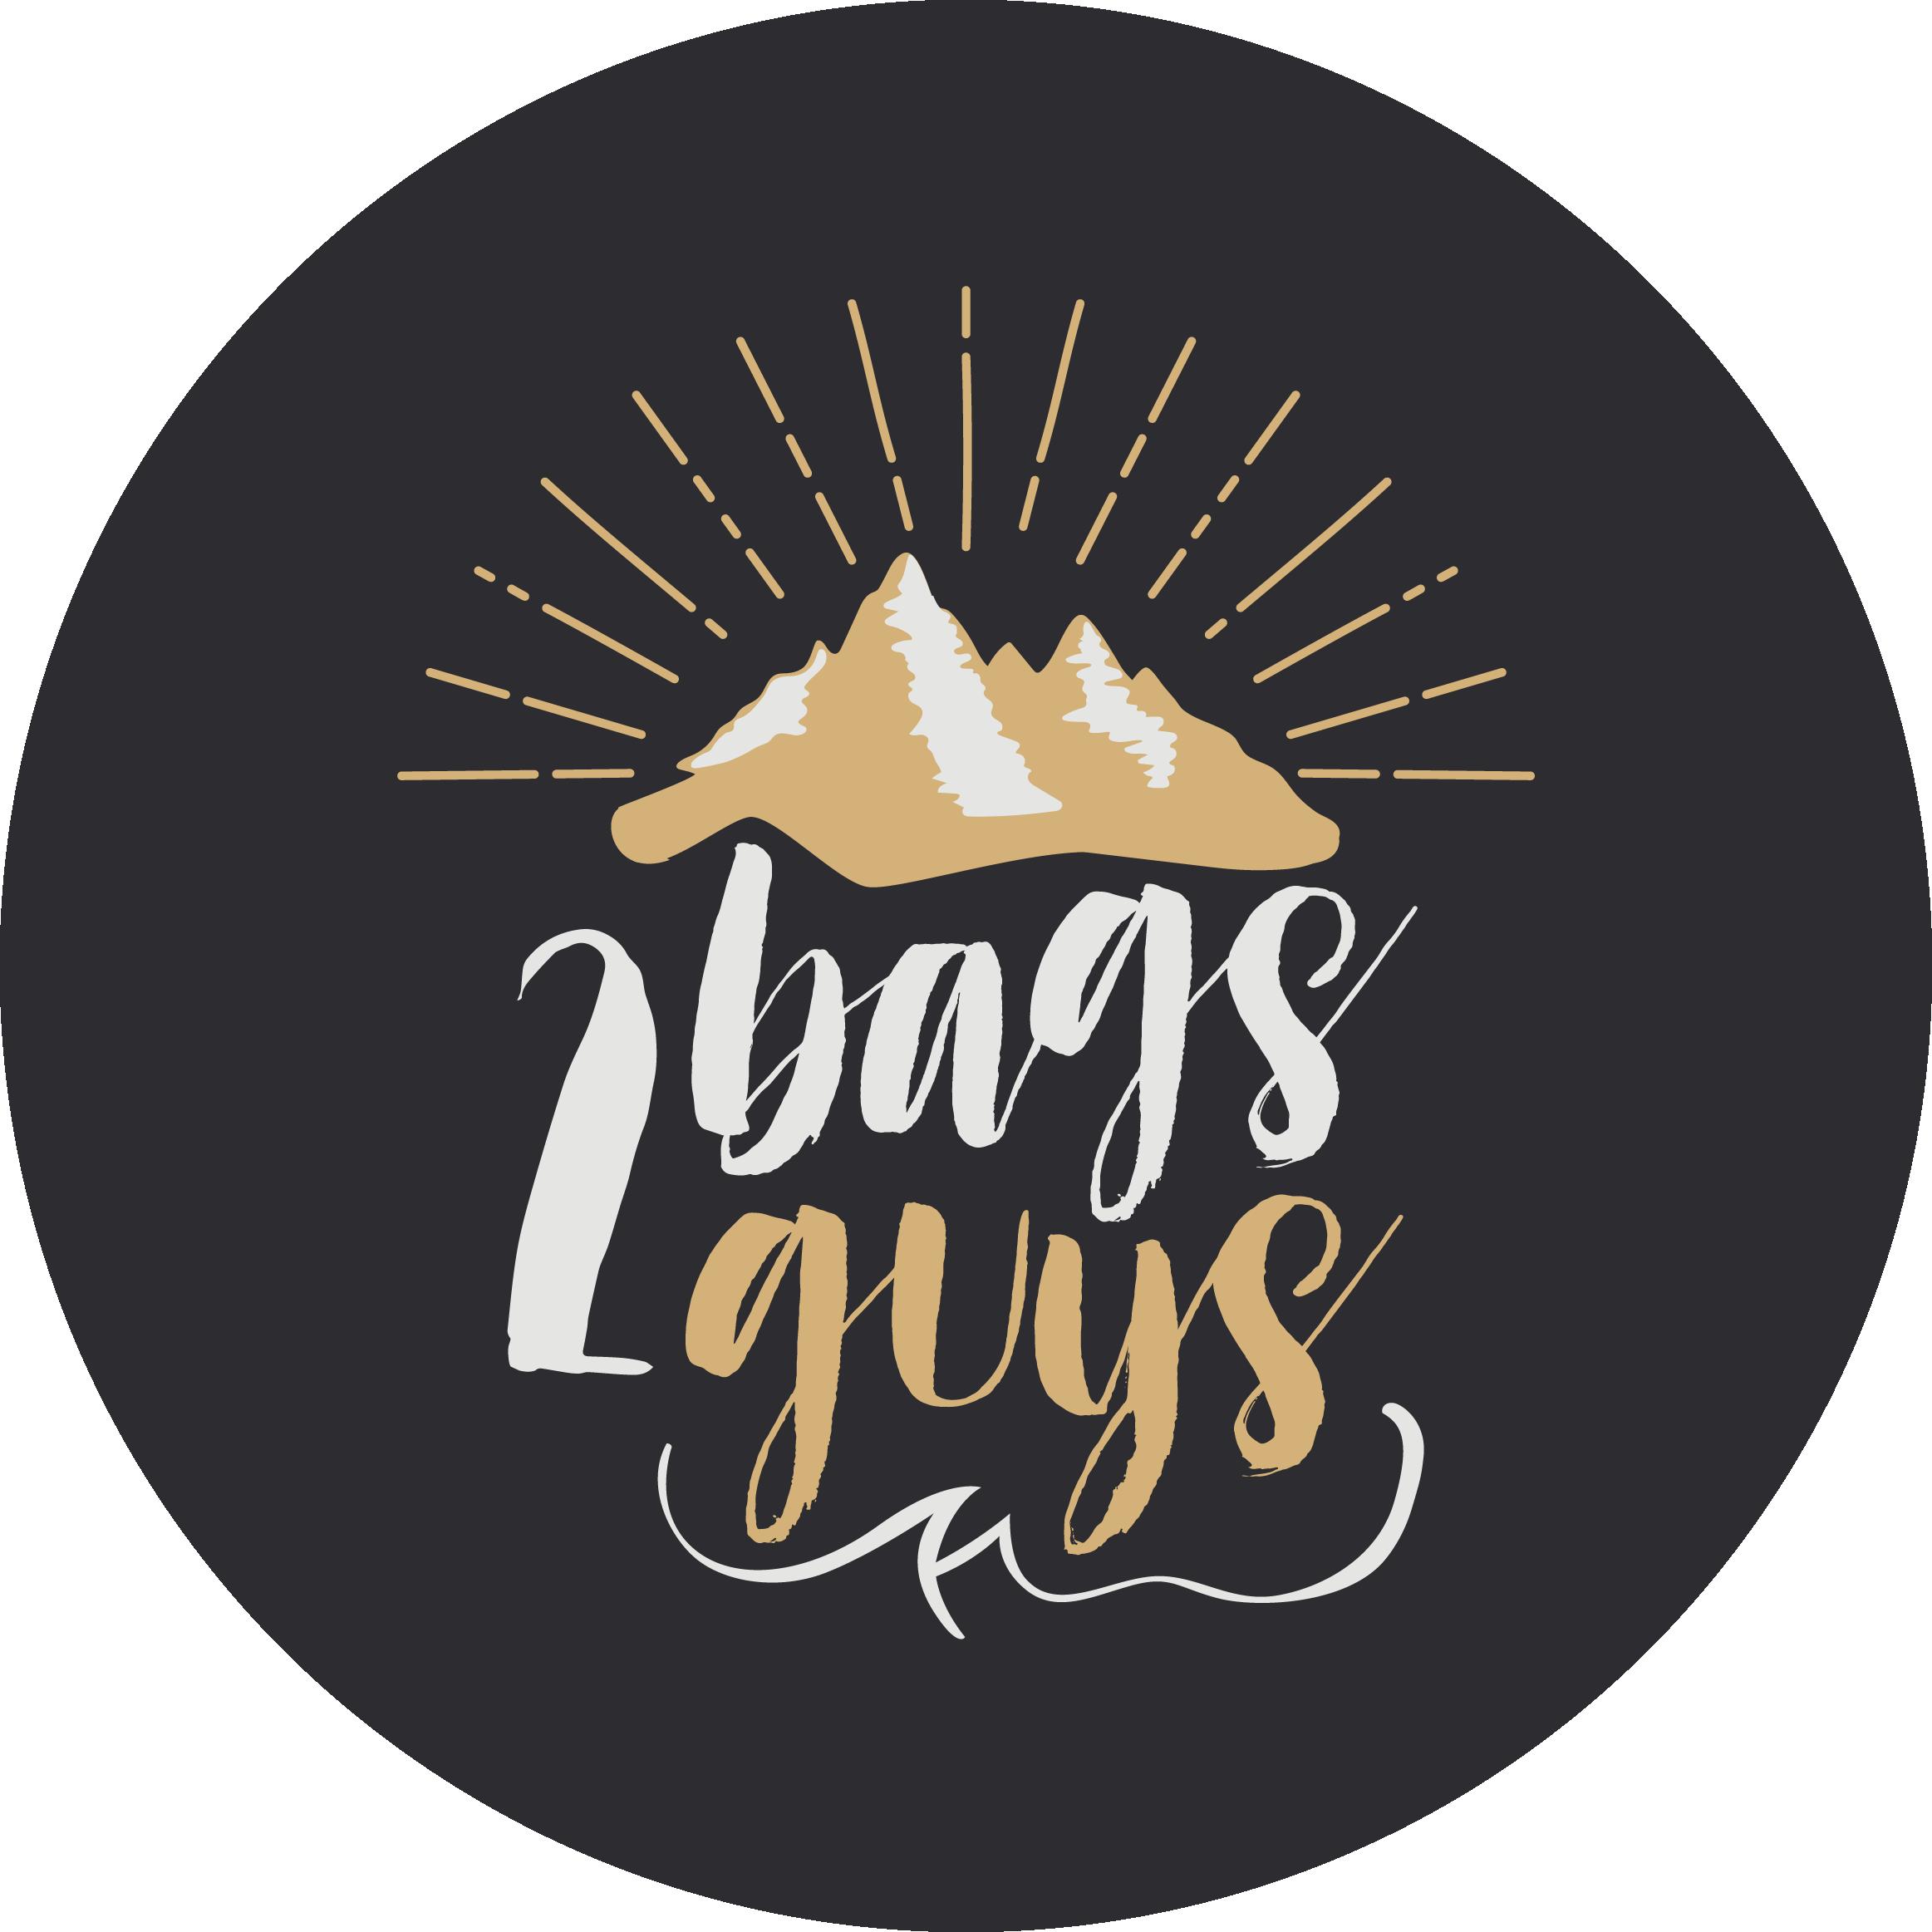 2bags2guys – Blog Voyage | Bons Plans Voyage | France